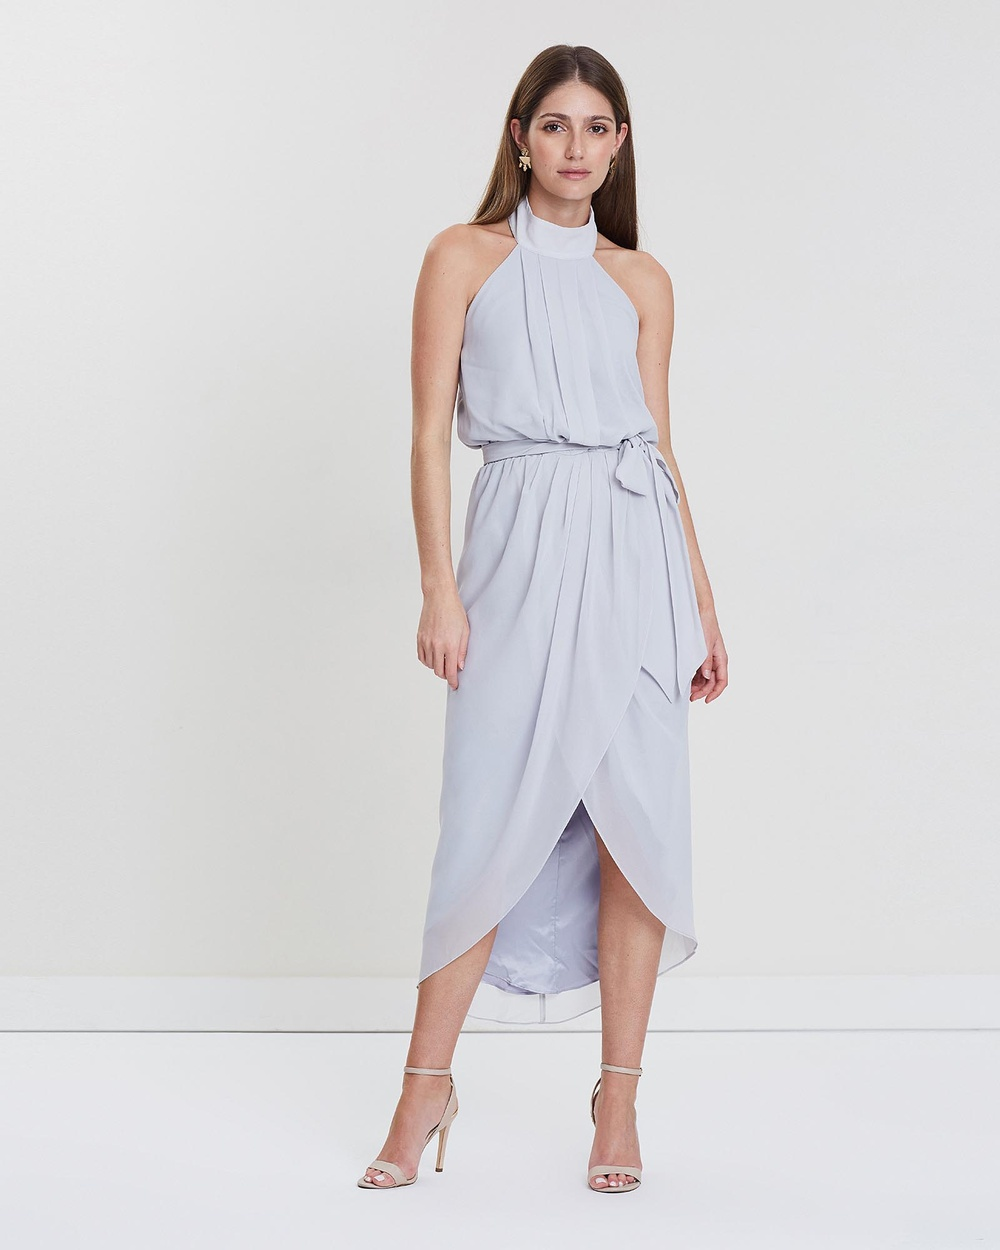 Esther Luxe Grey Amaryllis Dress